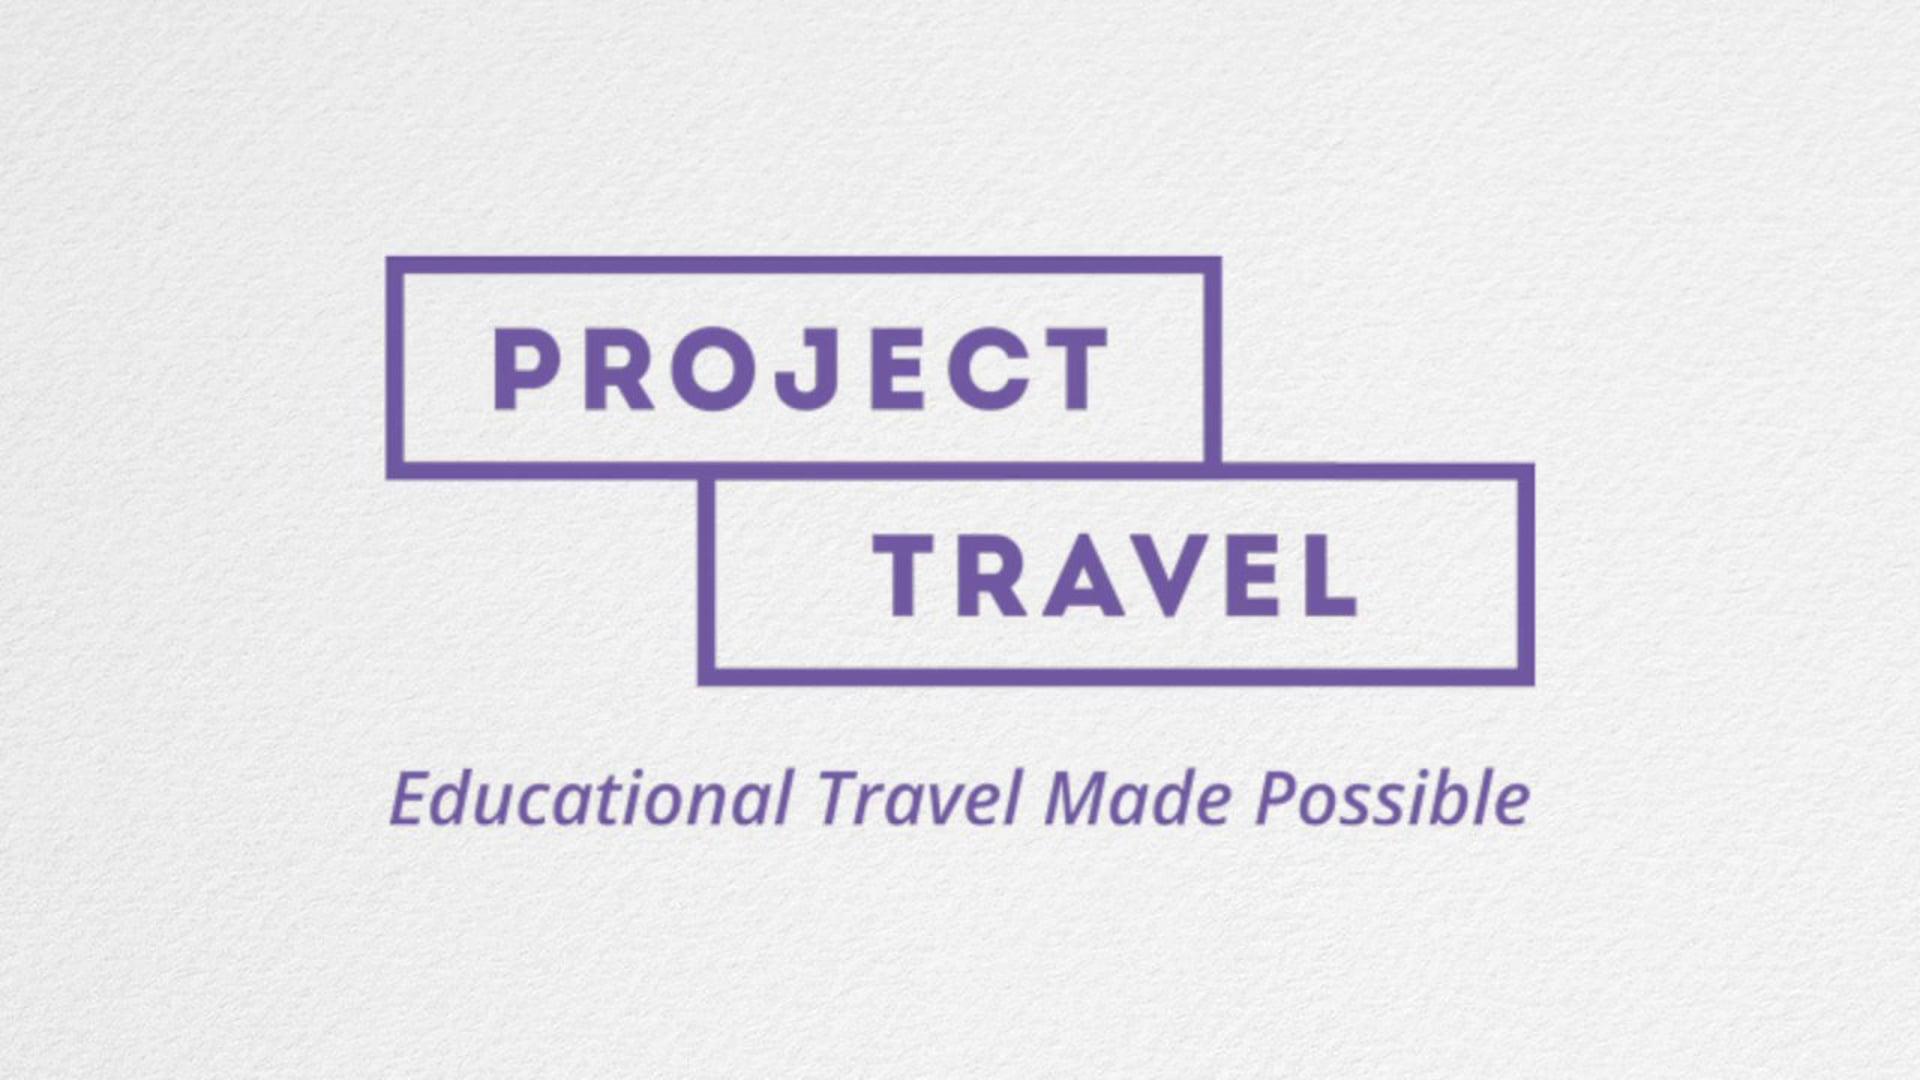 Project Travel - Online Promo Spot